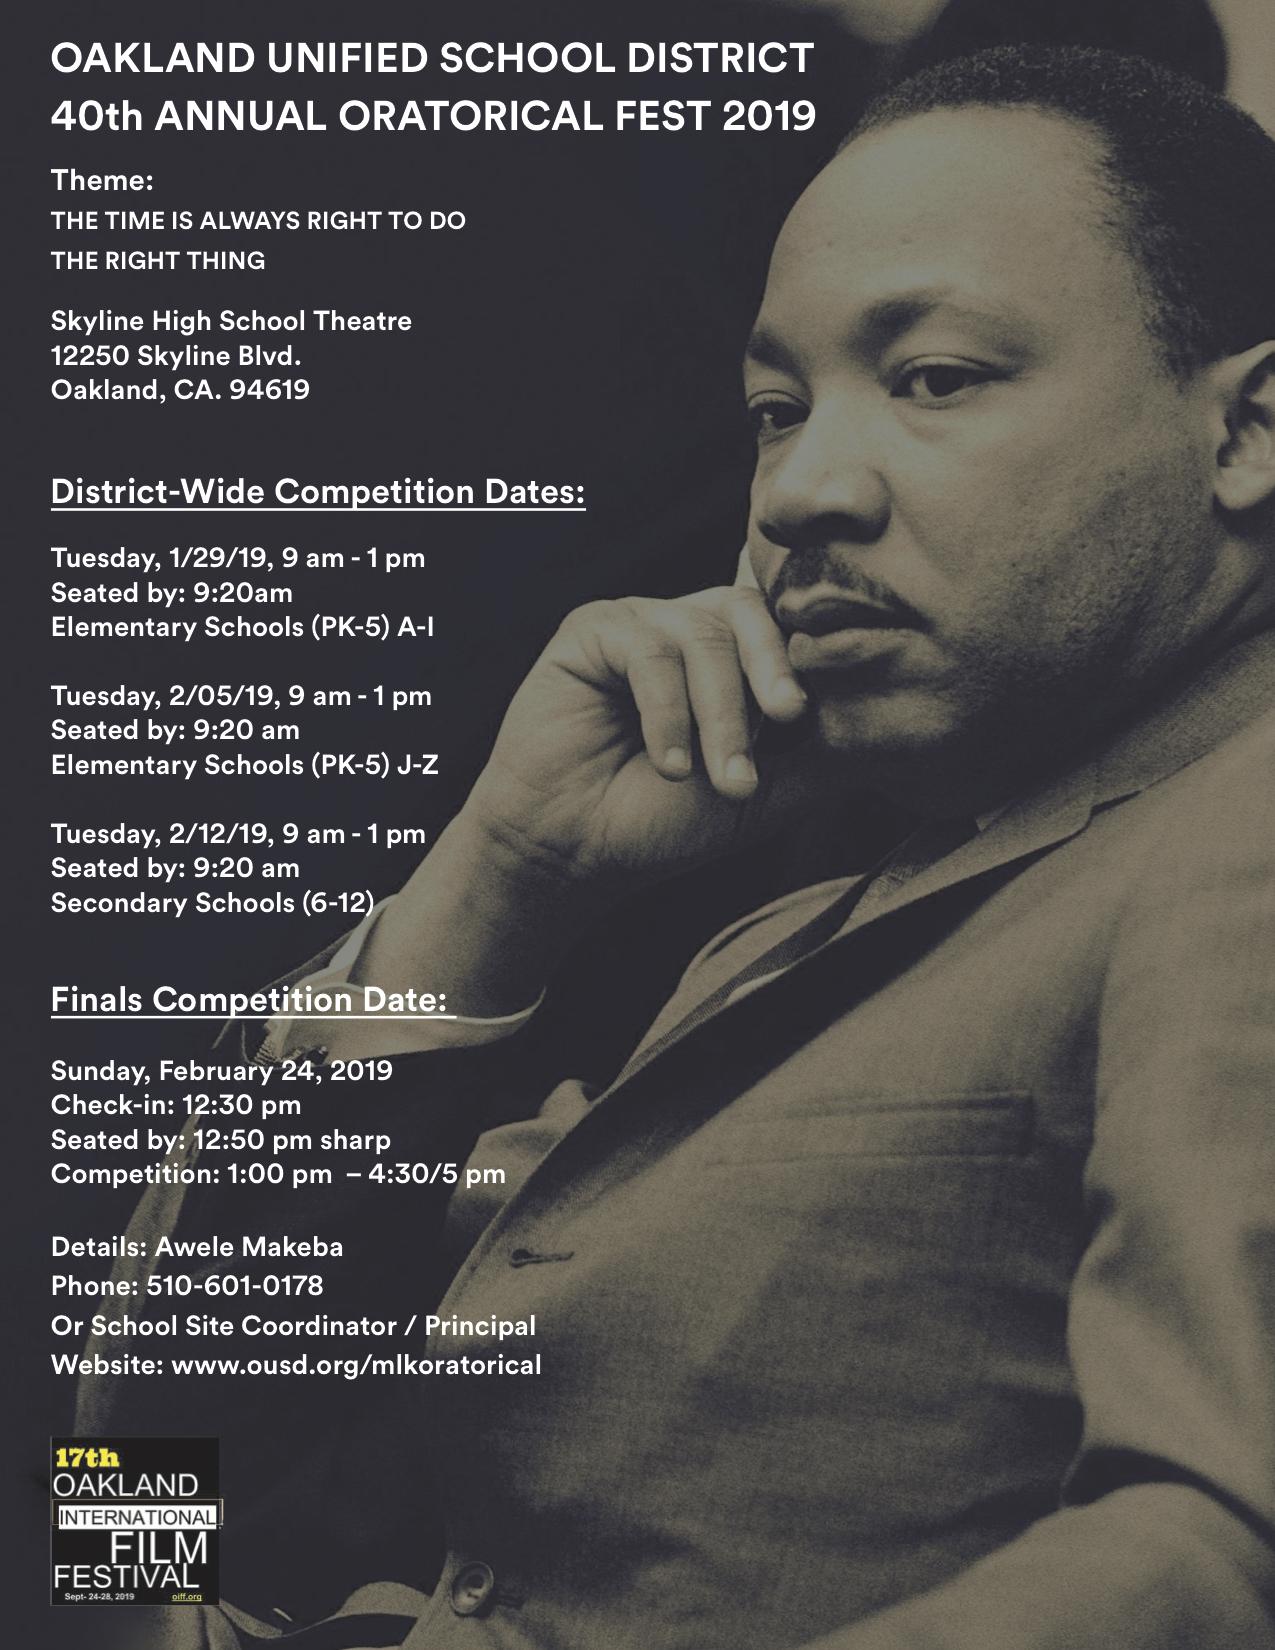 OUSD MLK Oratorical / 40th Annual MLK Oratorical